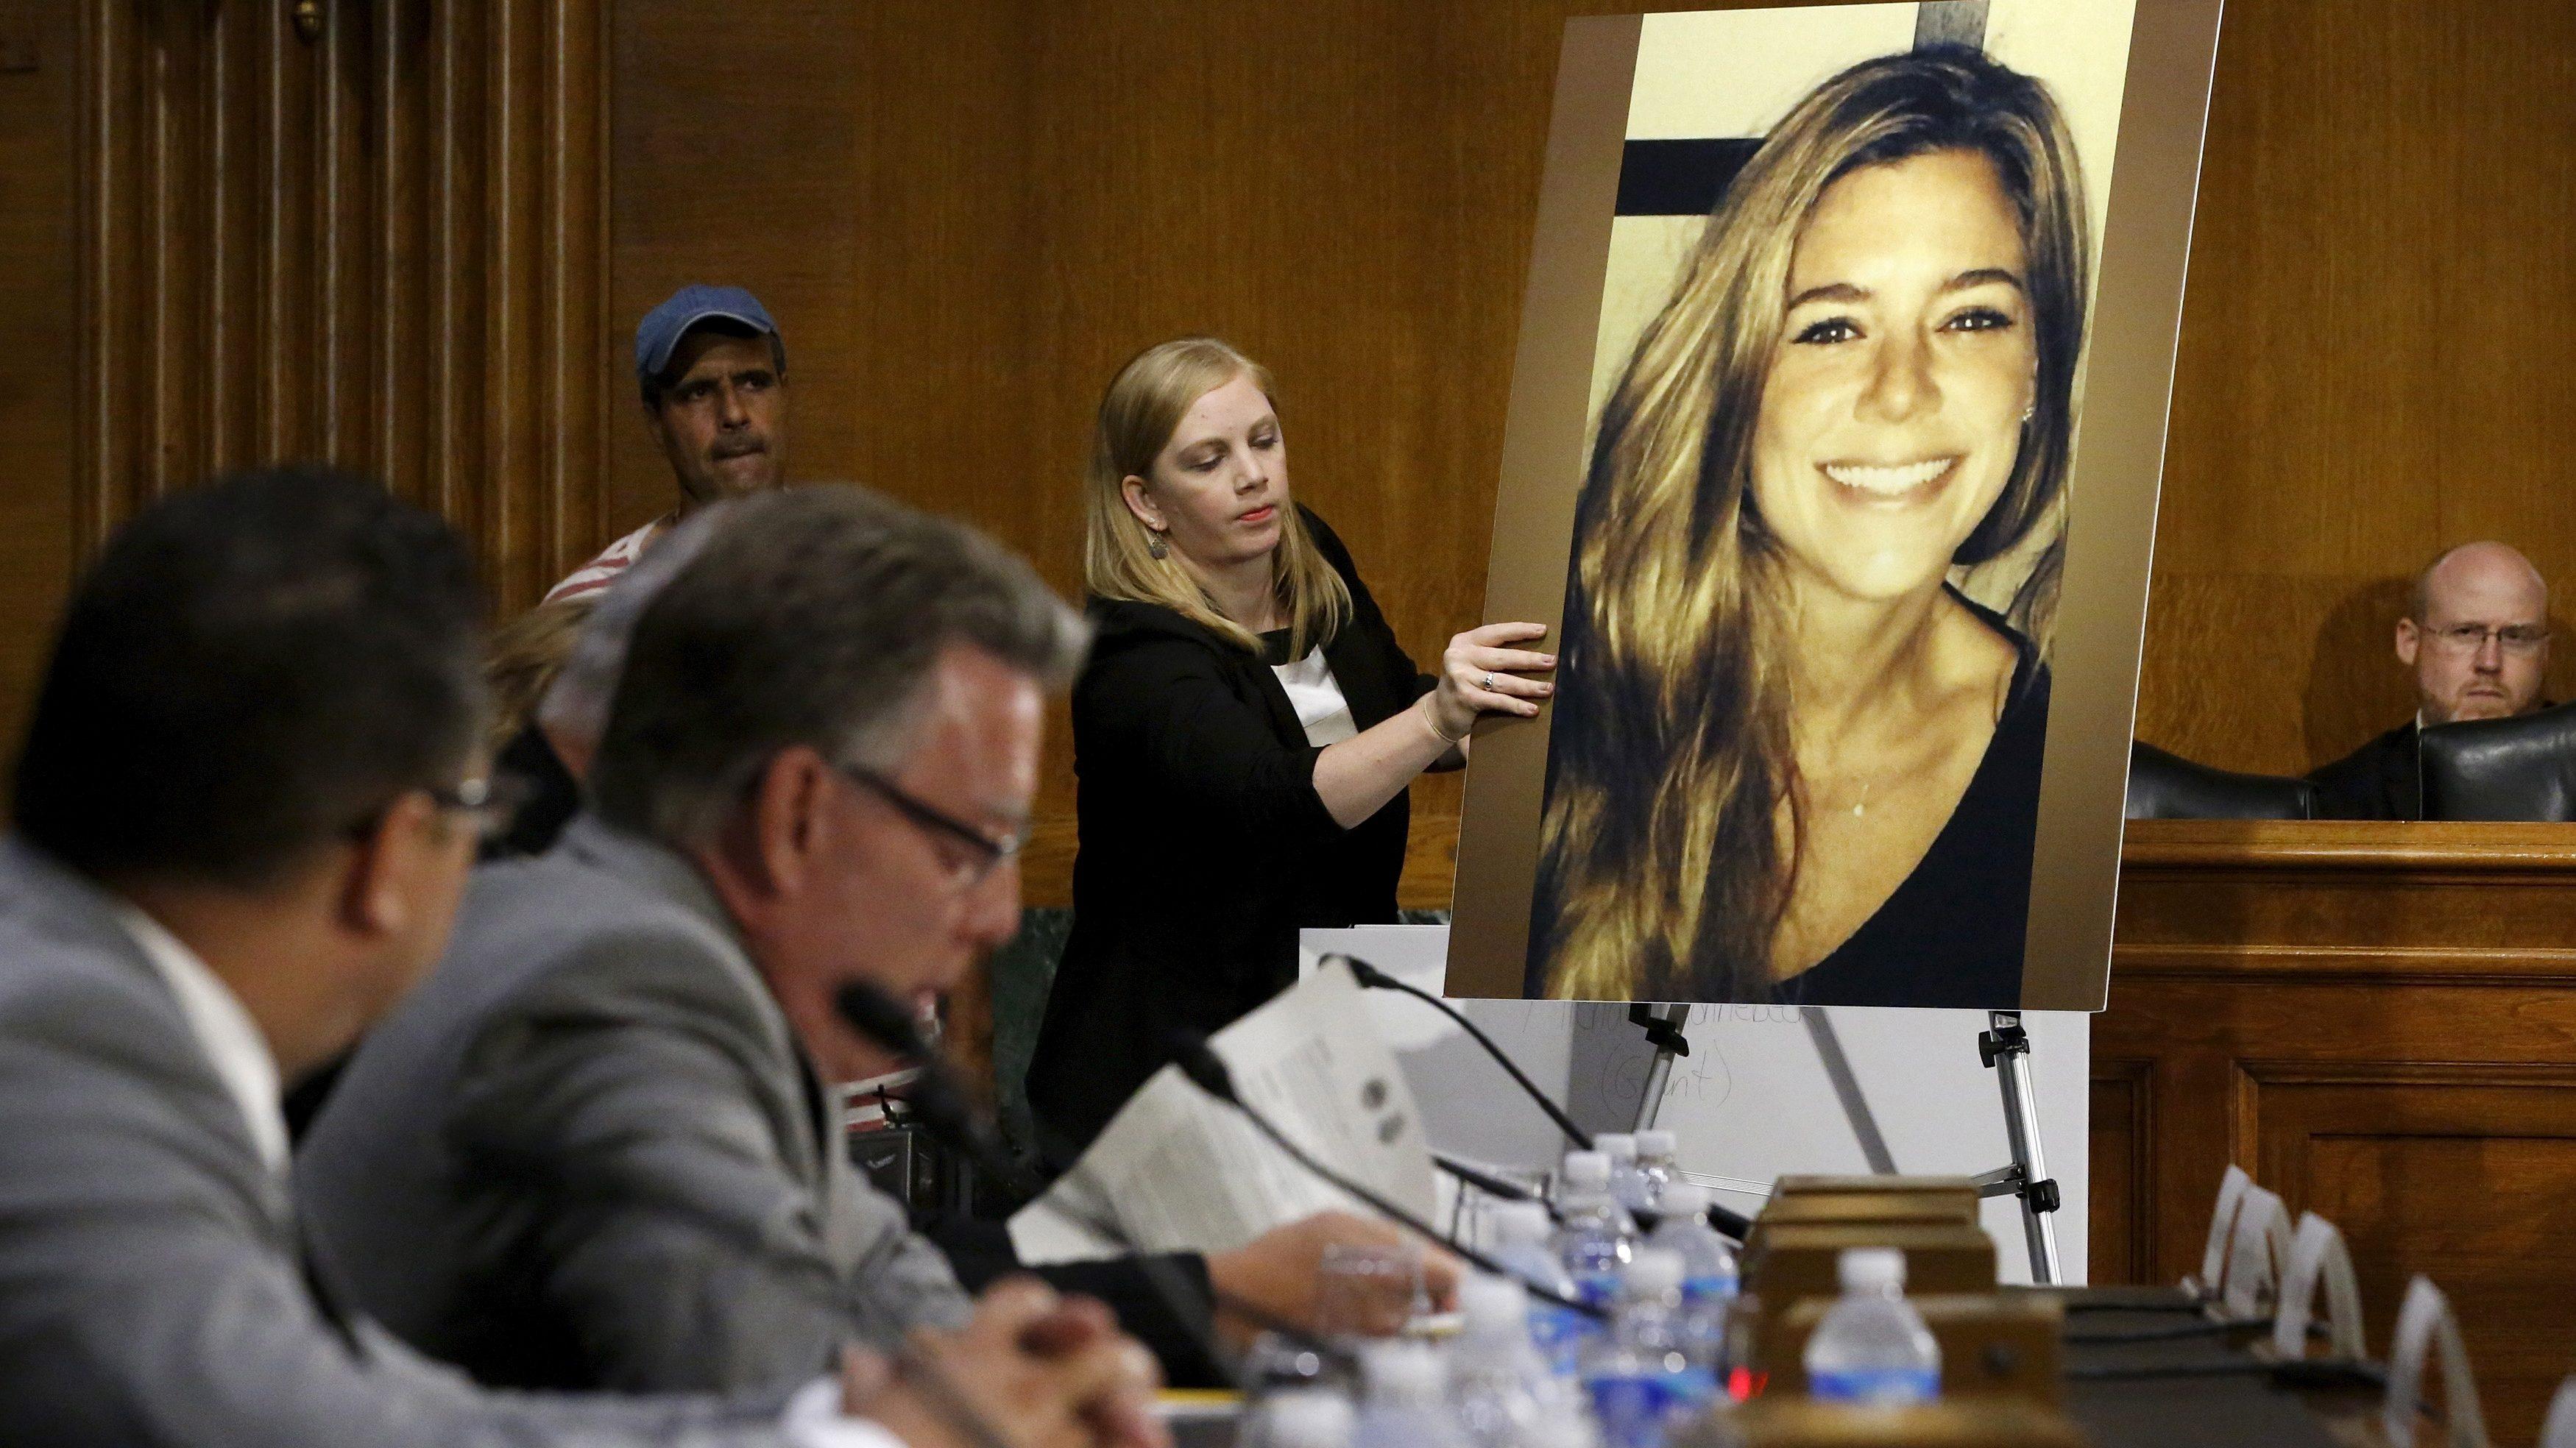 A photo of victim Kathryn Steinle